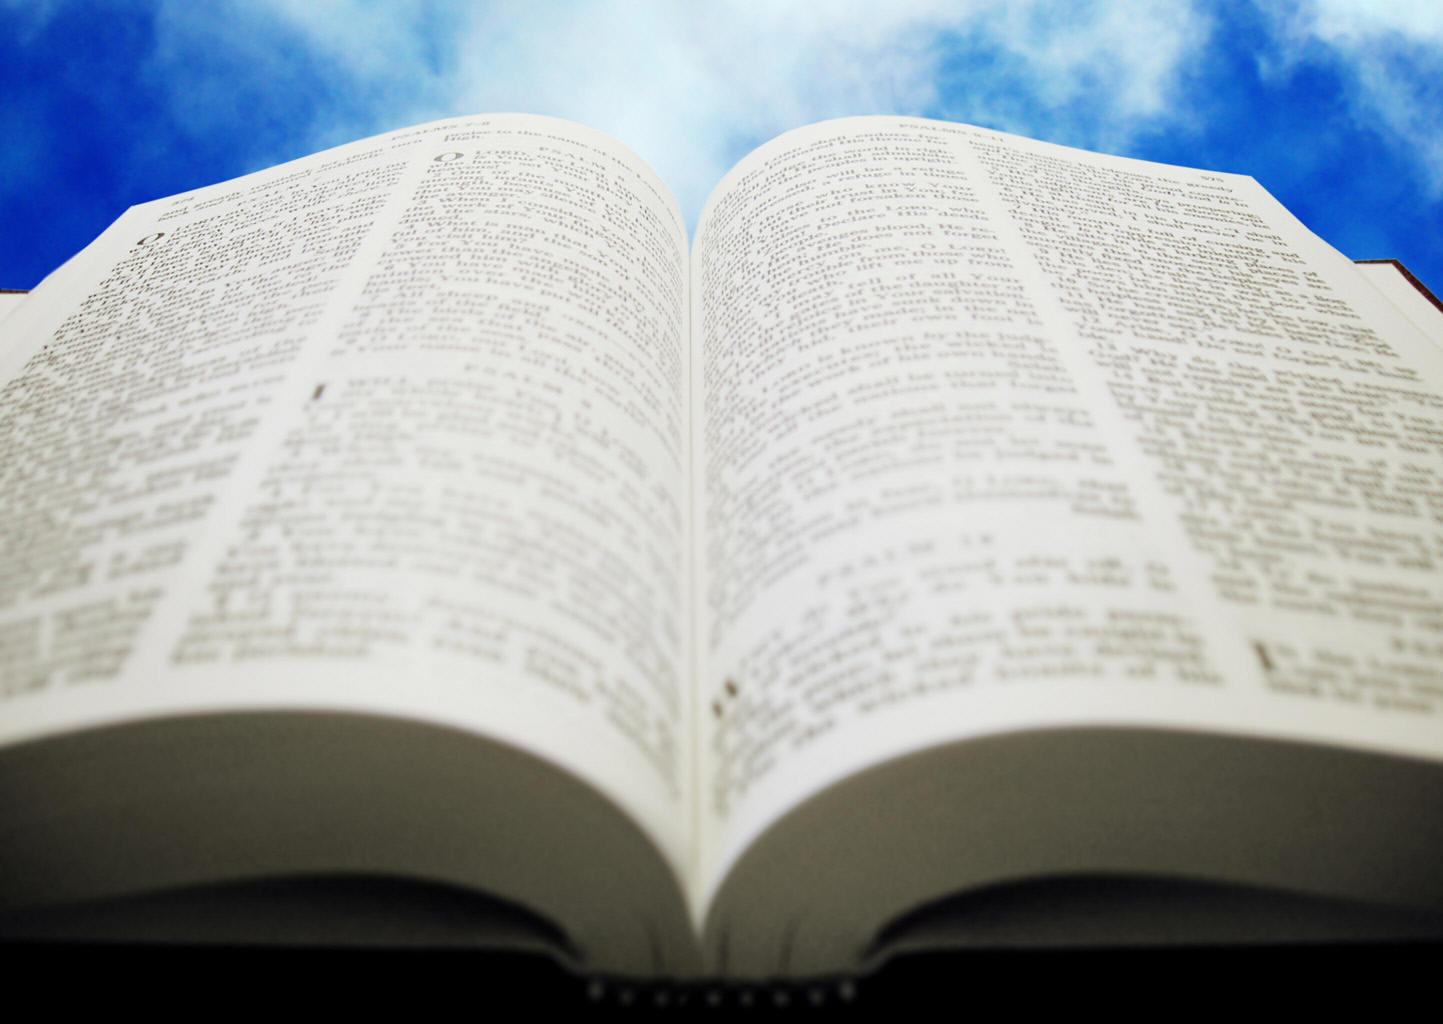 holy bible nkjv download free